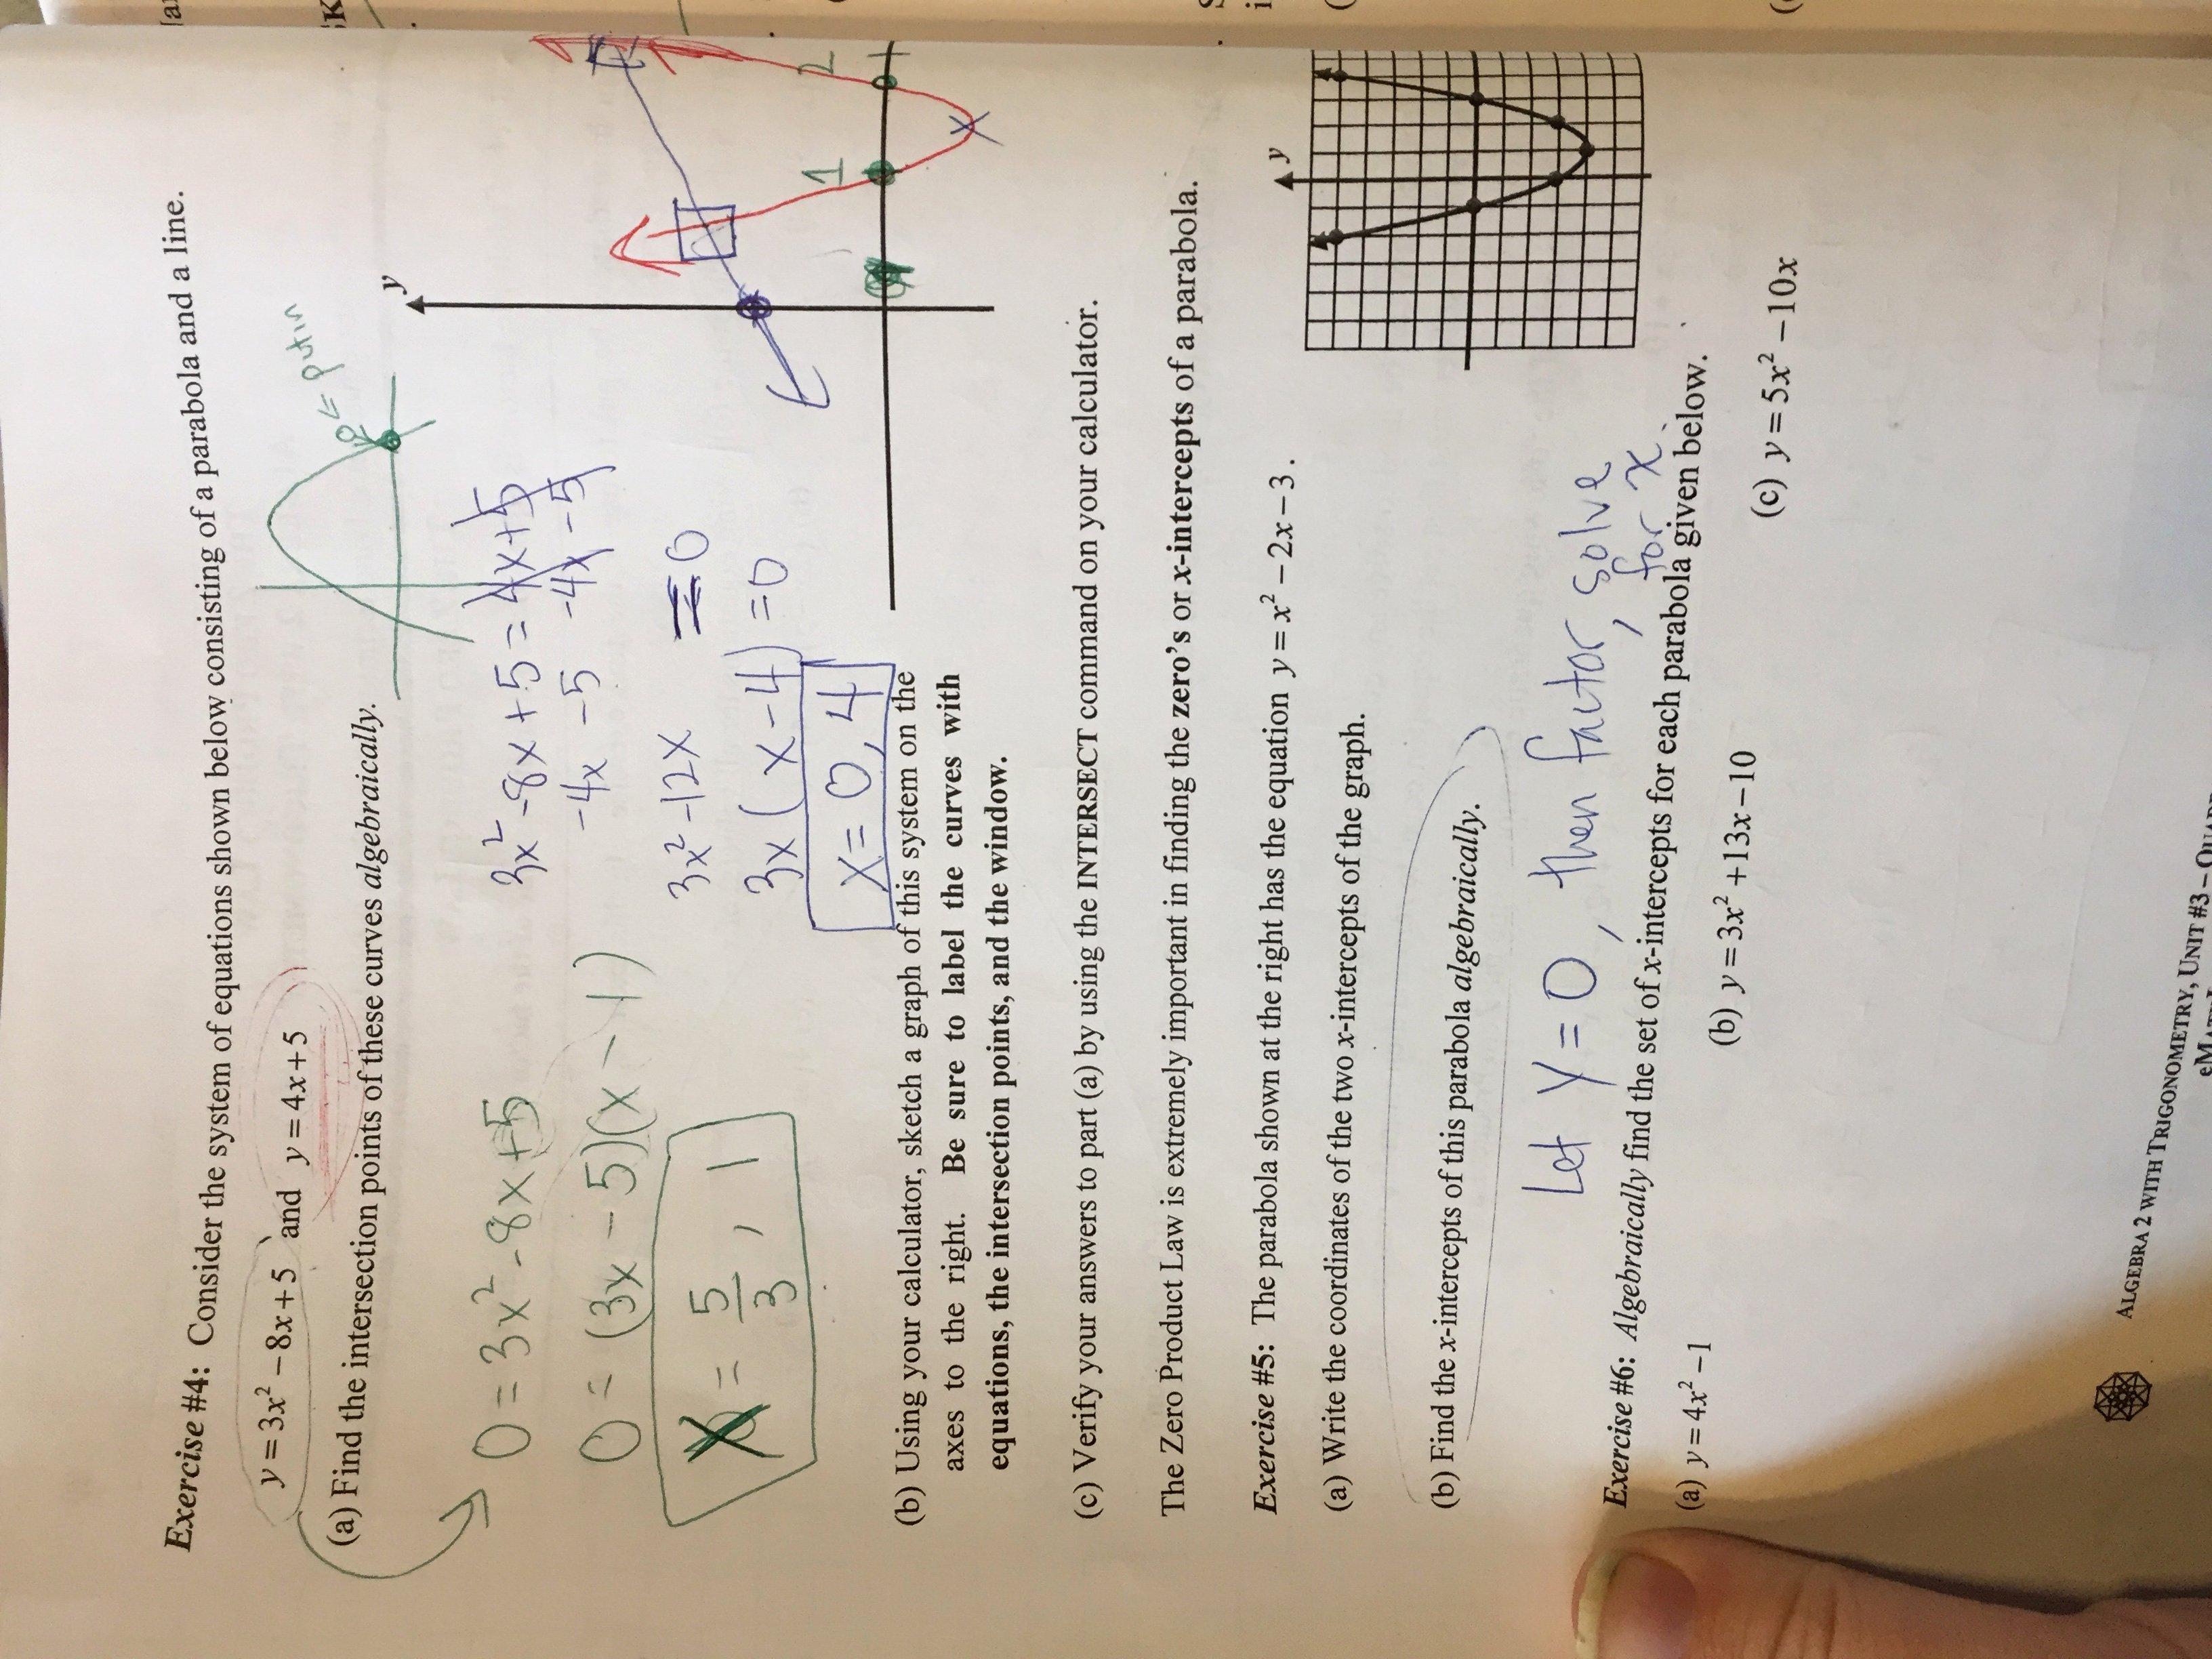 Zero Product Property Worksheet Elegant Unit 3 Quadratic Functions Lizzy S Classroom